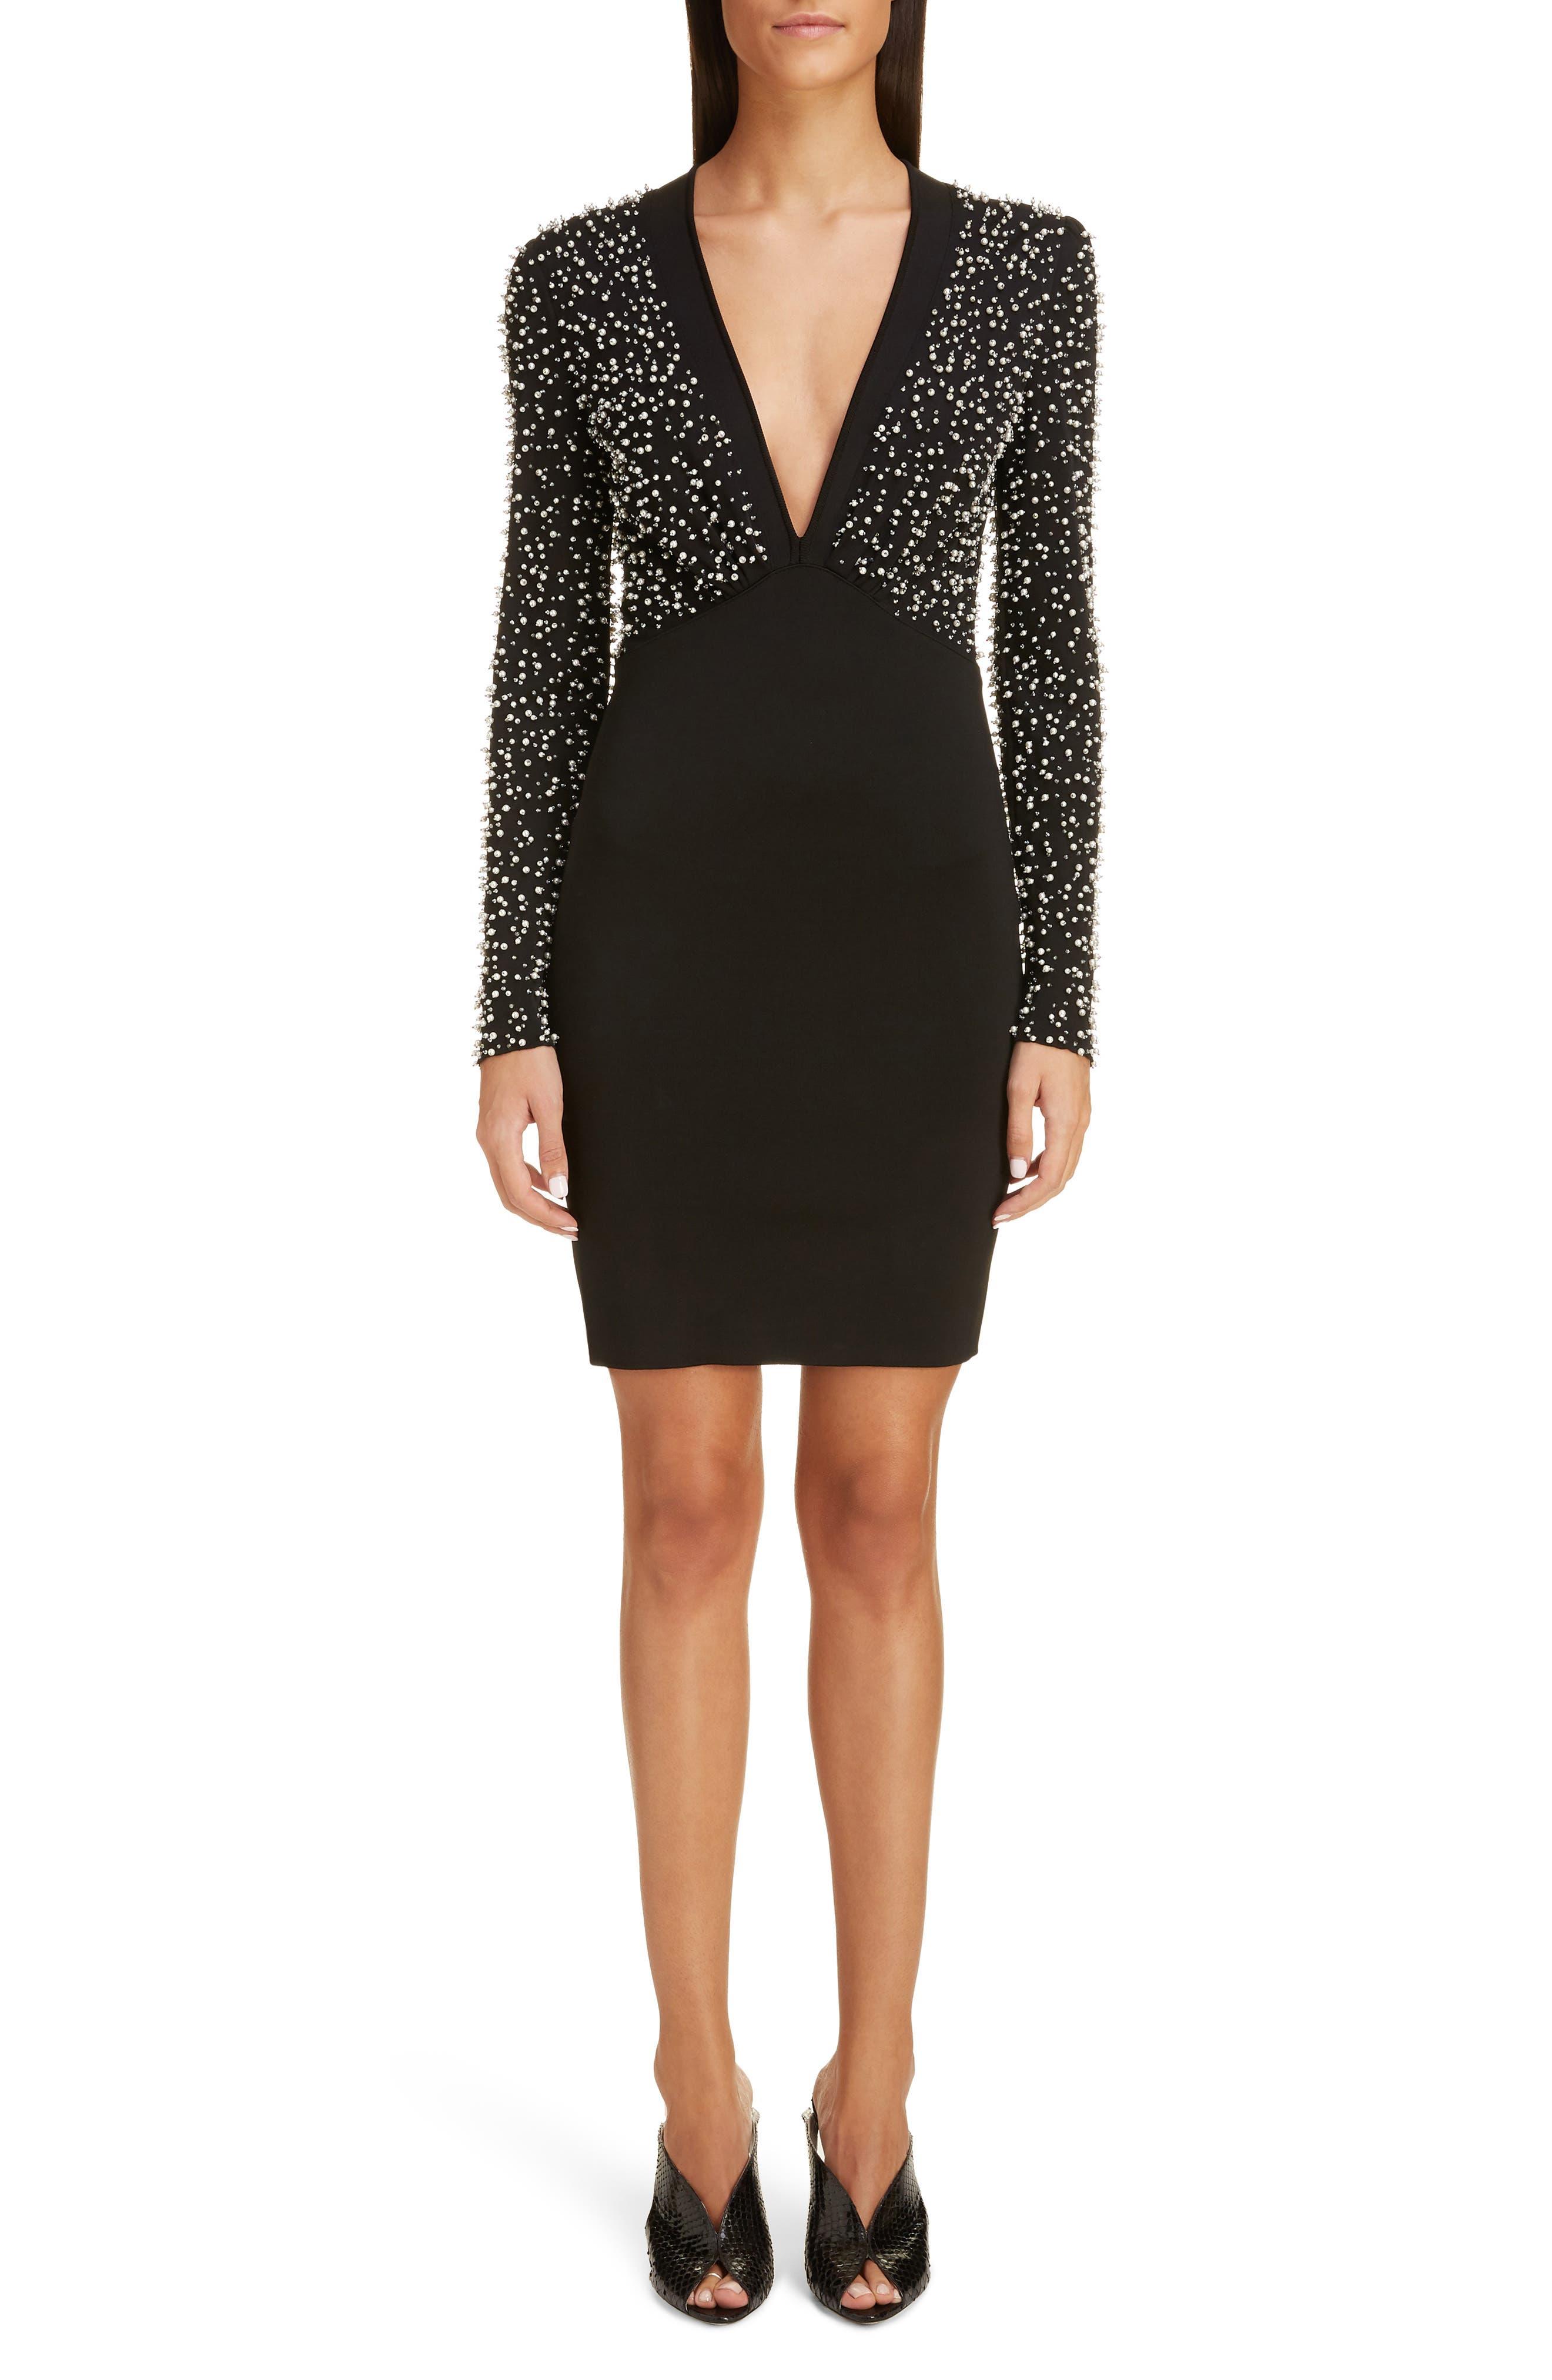 Givenchy Beaded Long Sleeve Dress, Black